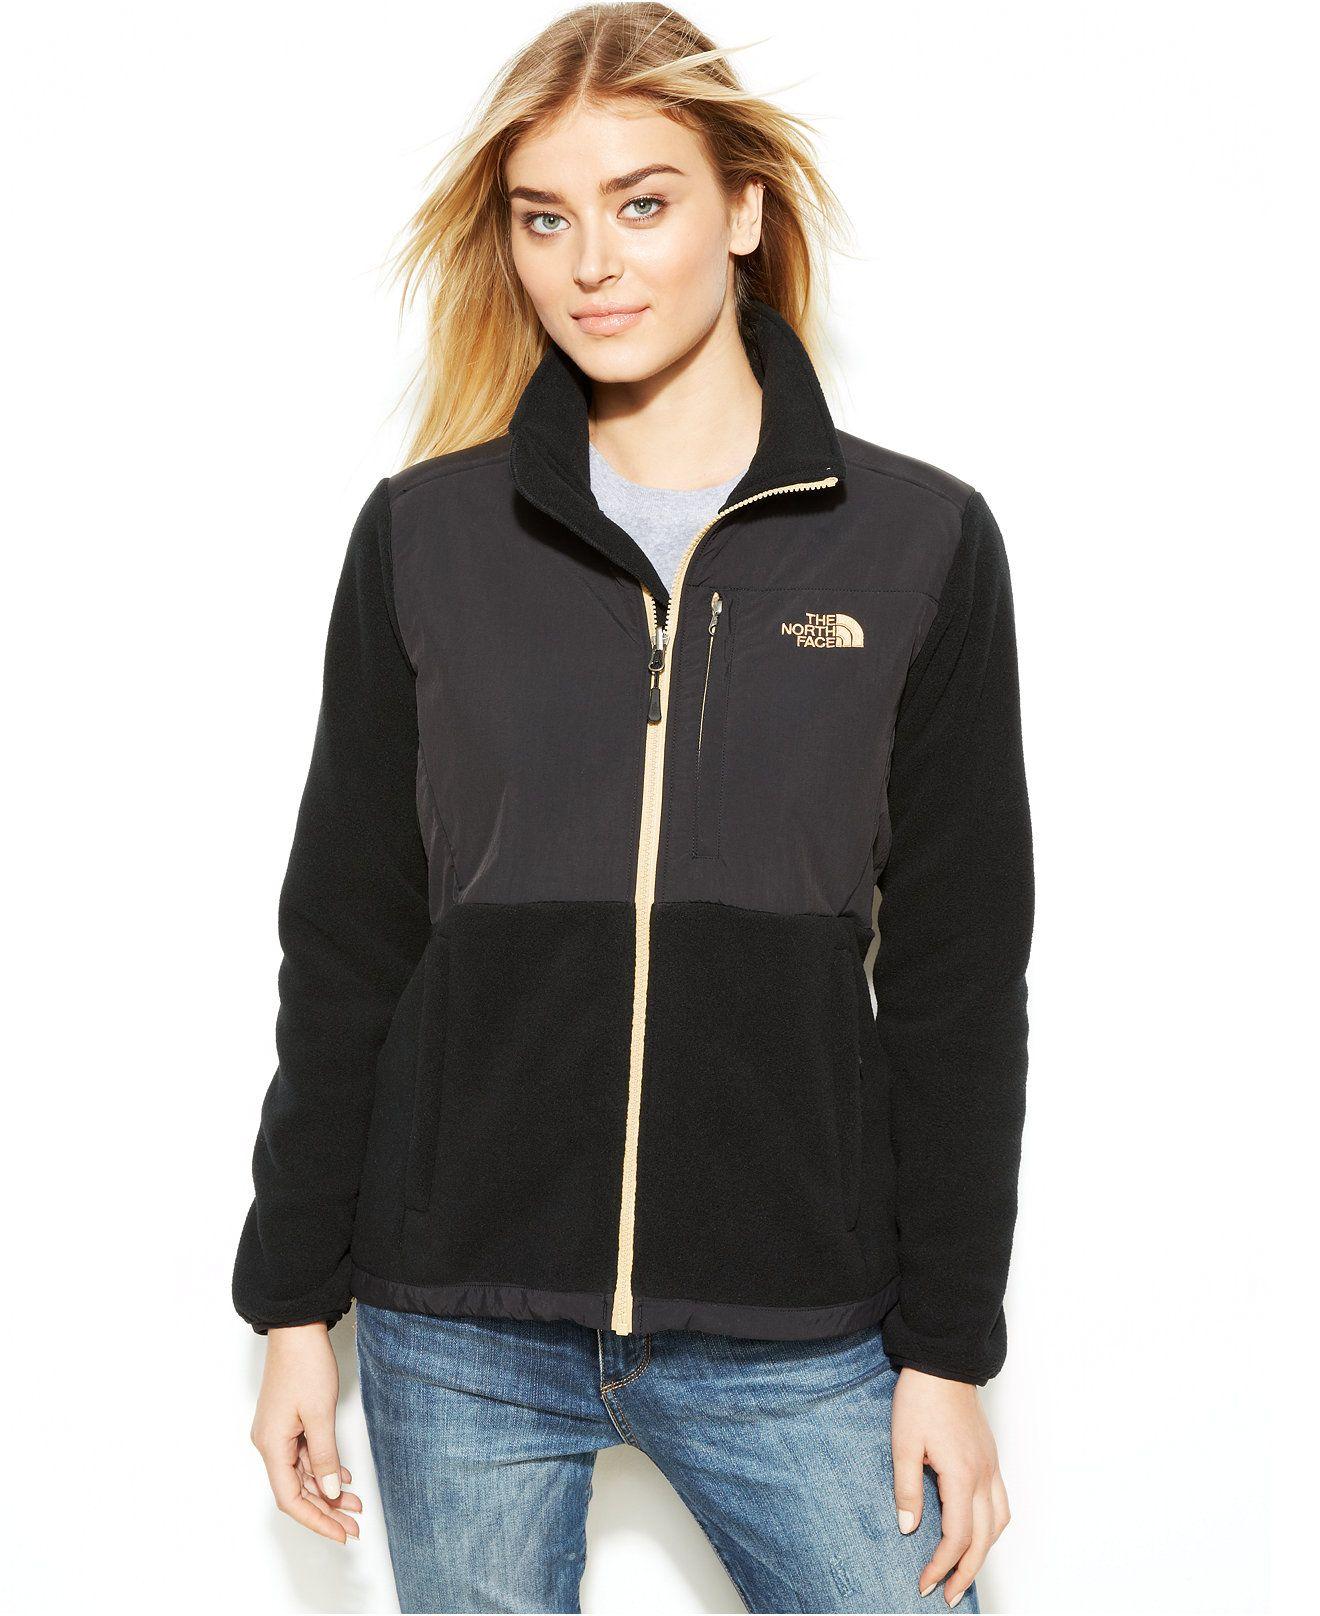 The North Face Denali Fleece Jacket Coats Women Macy S Blazer Jackets For Women Jackets For Women Jackets [ 1616 x 1320 Pixel ]